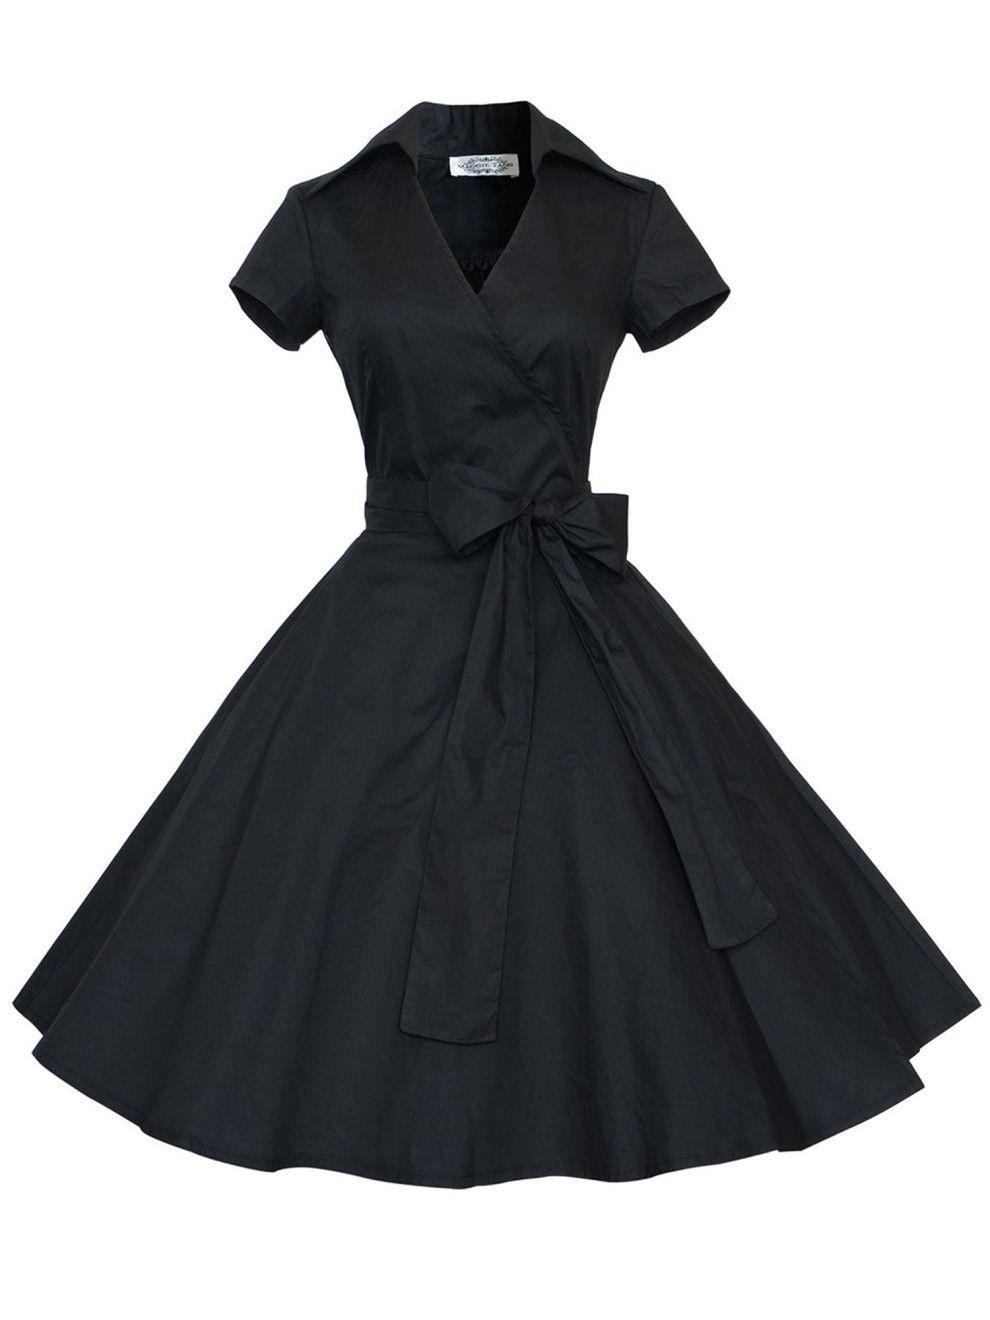 28 Dresses No One Will Ever Believe You Got From Walmart Plus Size Vintage Dresses Vintage Dresses 50s Shirtwaist Dress [ 1320 x 990 Pixel ]